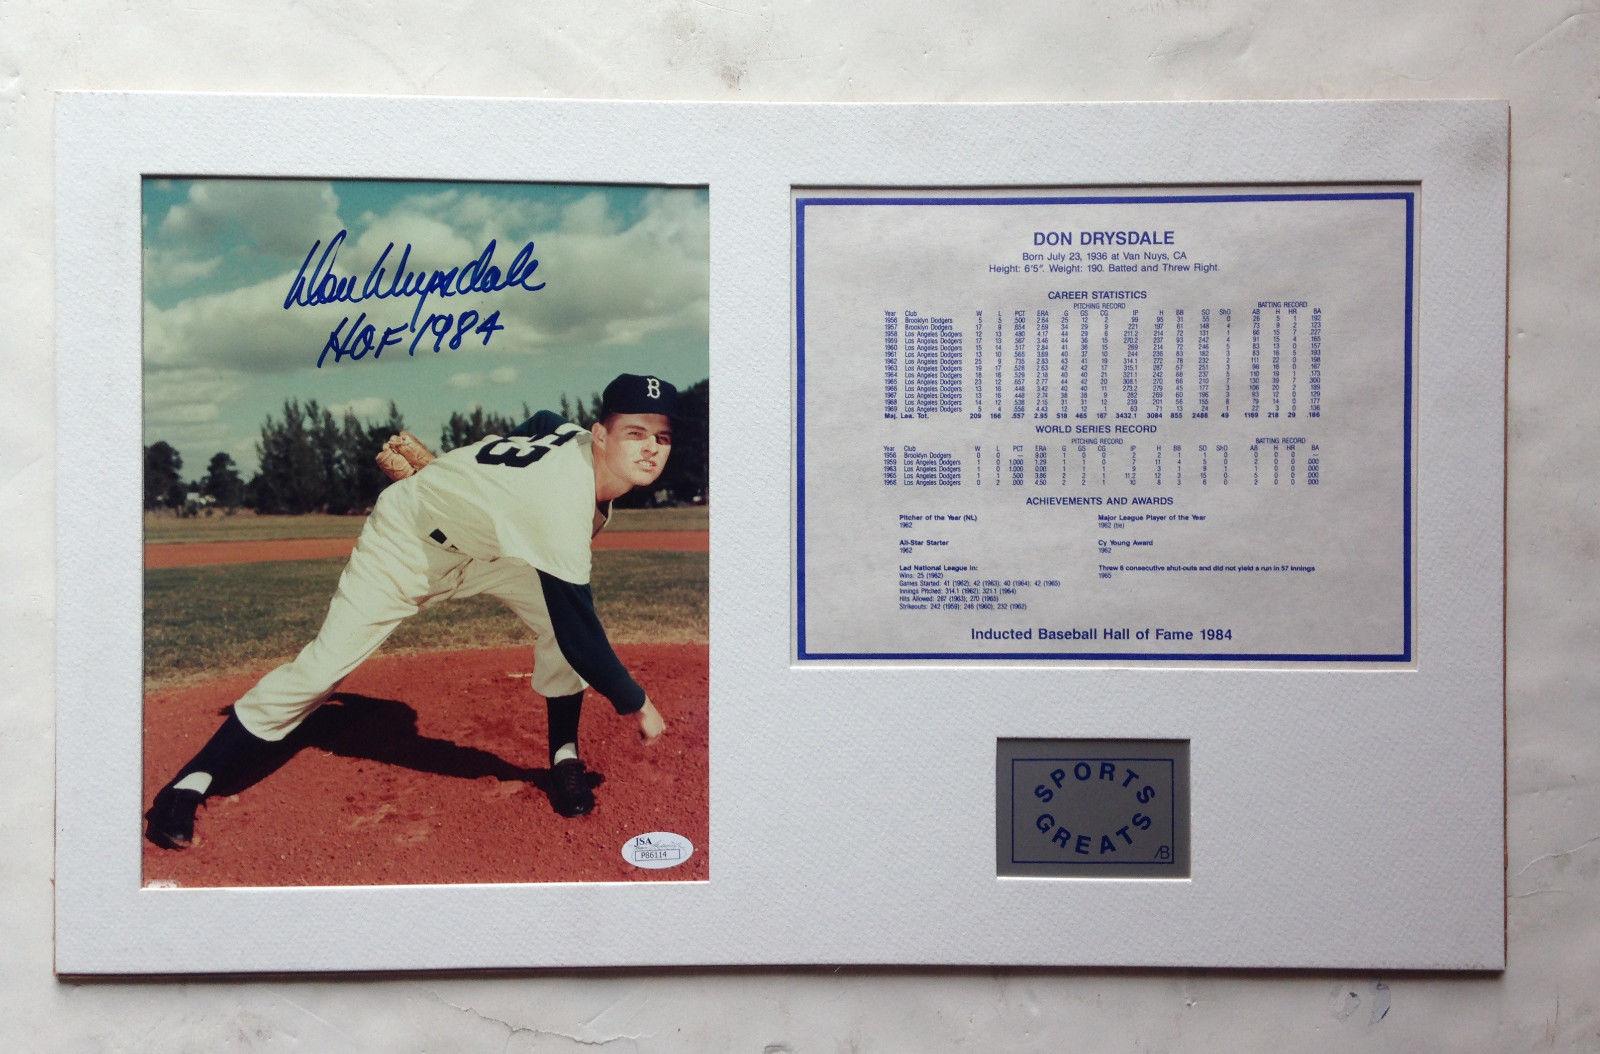 Don Drysdale Signed 8X10 PHOTO Collage Brooklyn Dodgers Ins Hof 1984 MT Auto JSA